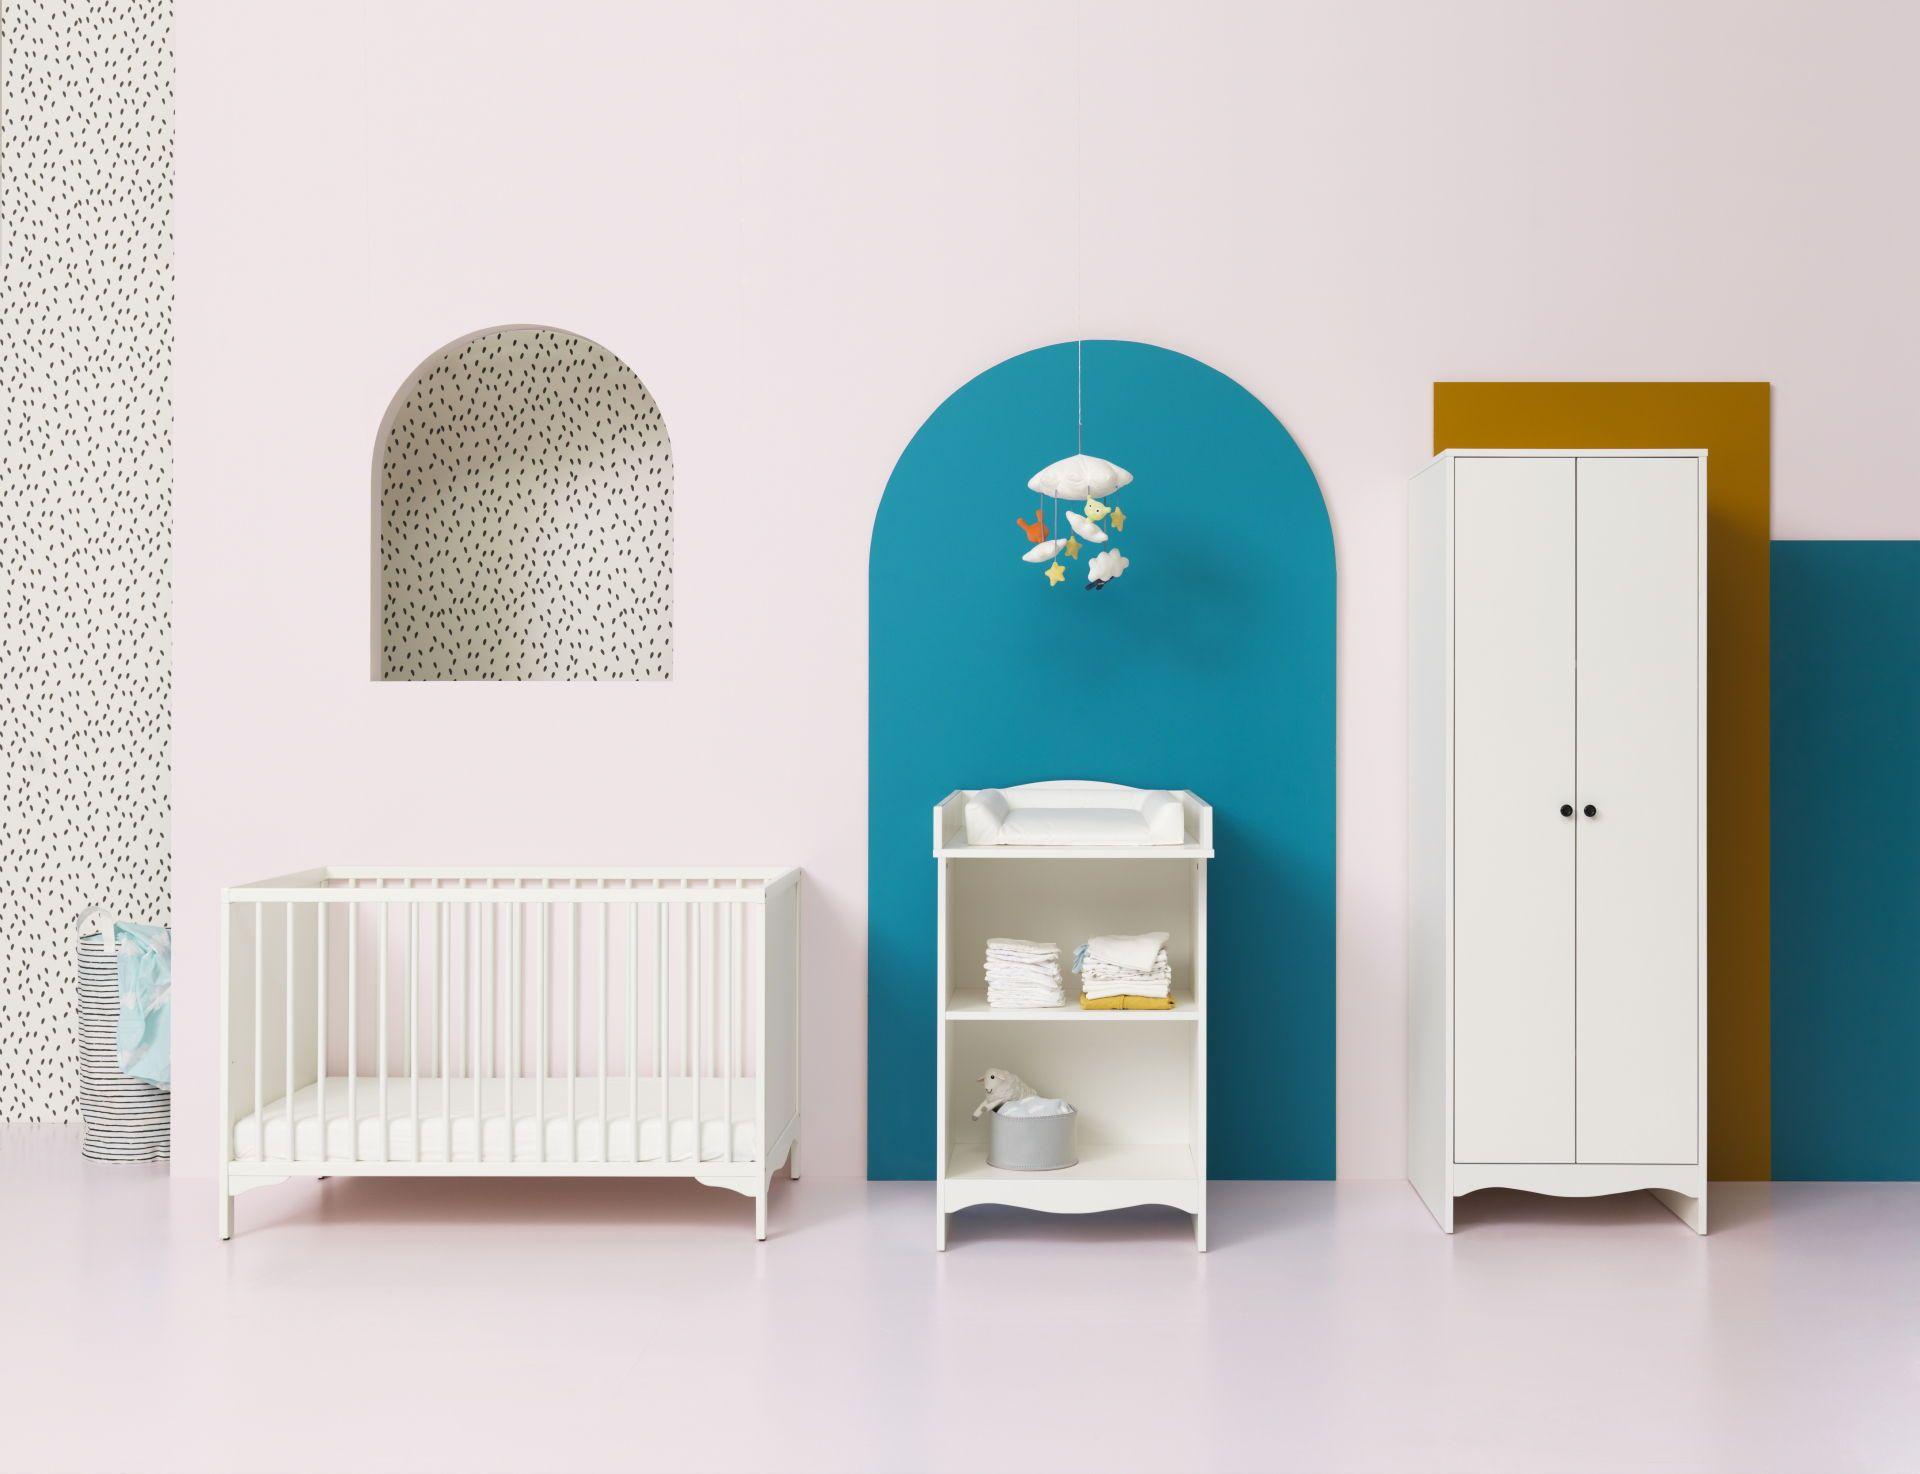 Ikea Opbergkast Kinderkamer.Solgul Kledingkast Wit Kinderen In 2019 Meubel Ideeen